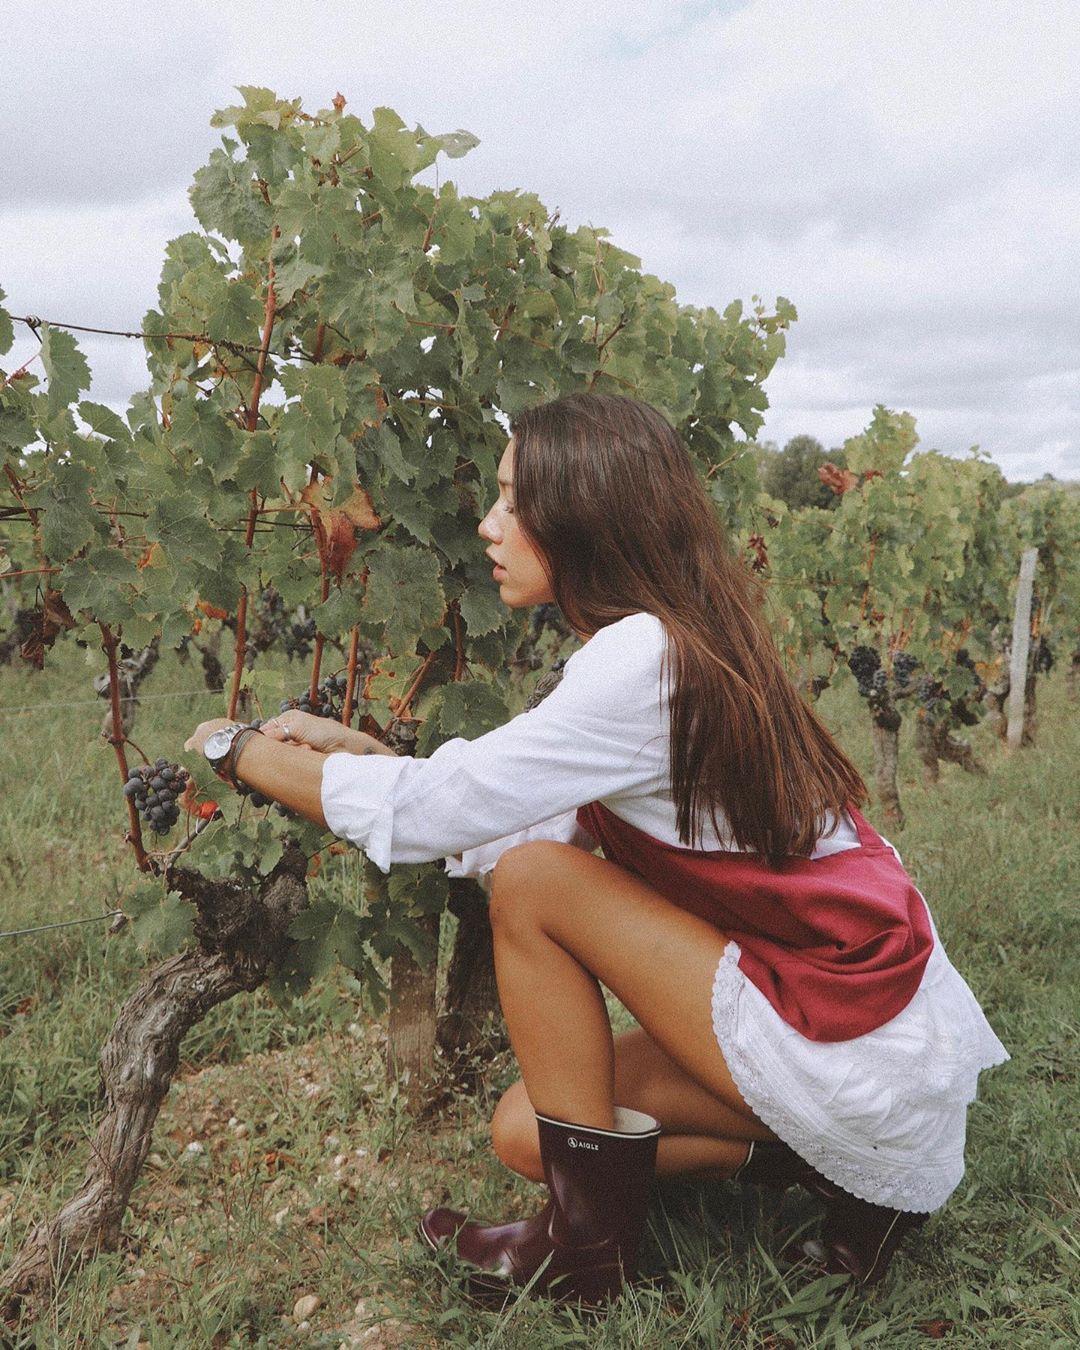 Melissa-Villarreal-Wallpapers-Insta-Fit-Bio-8